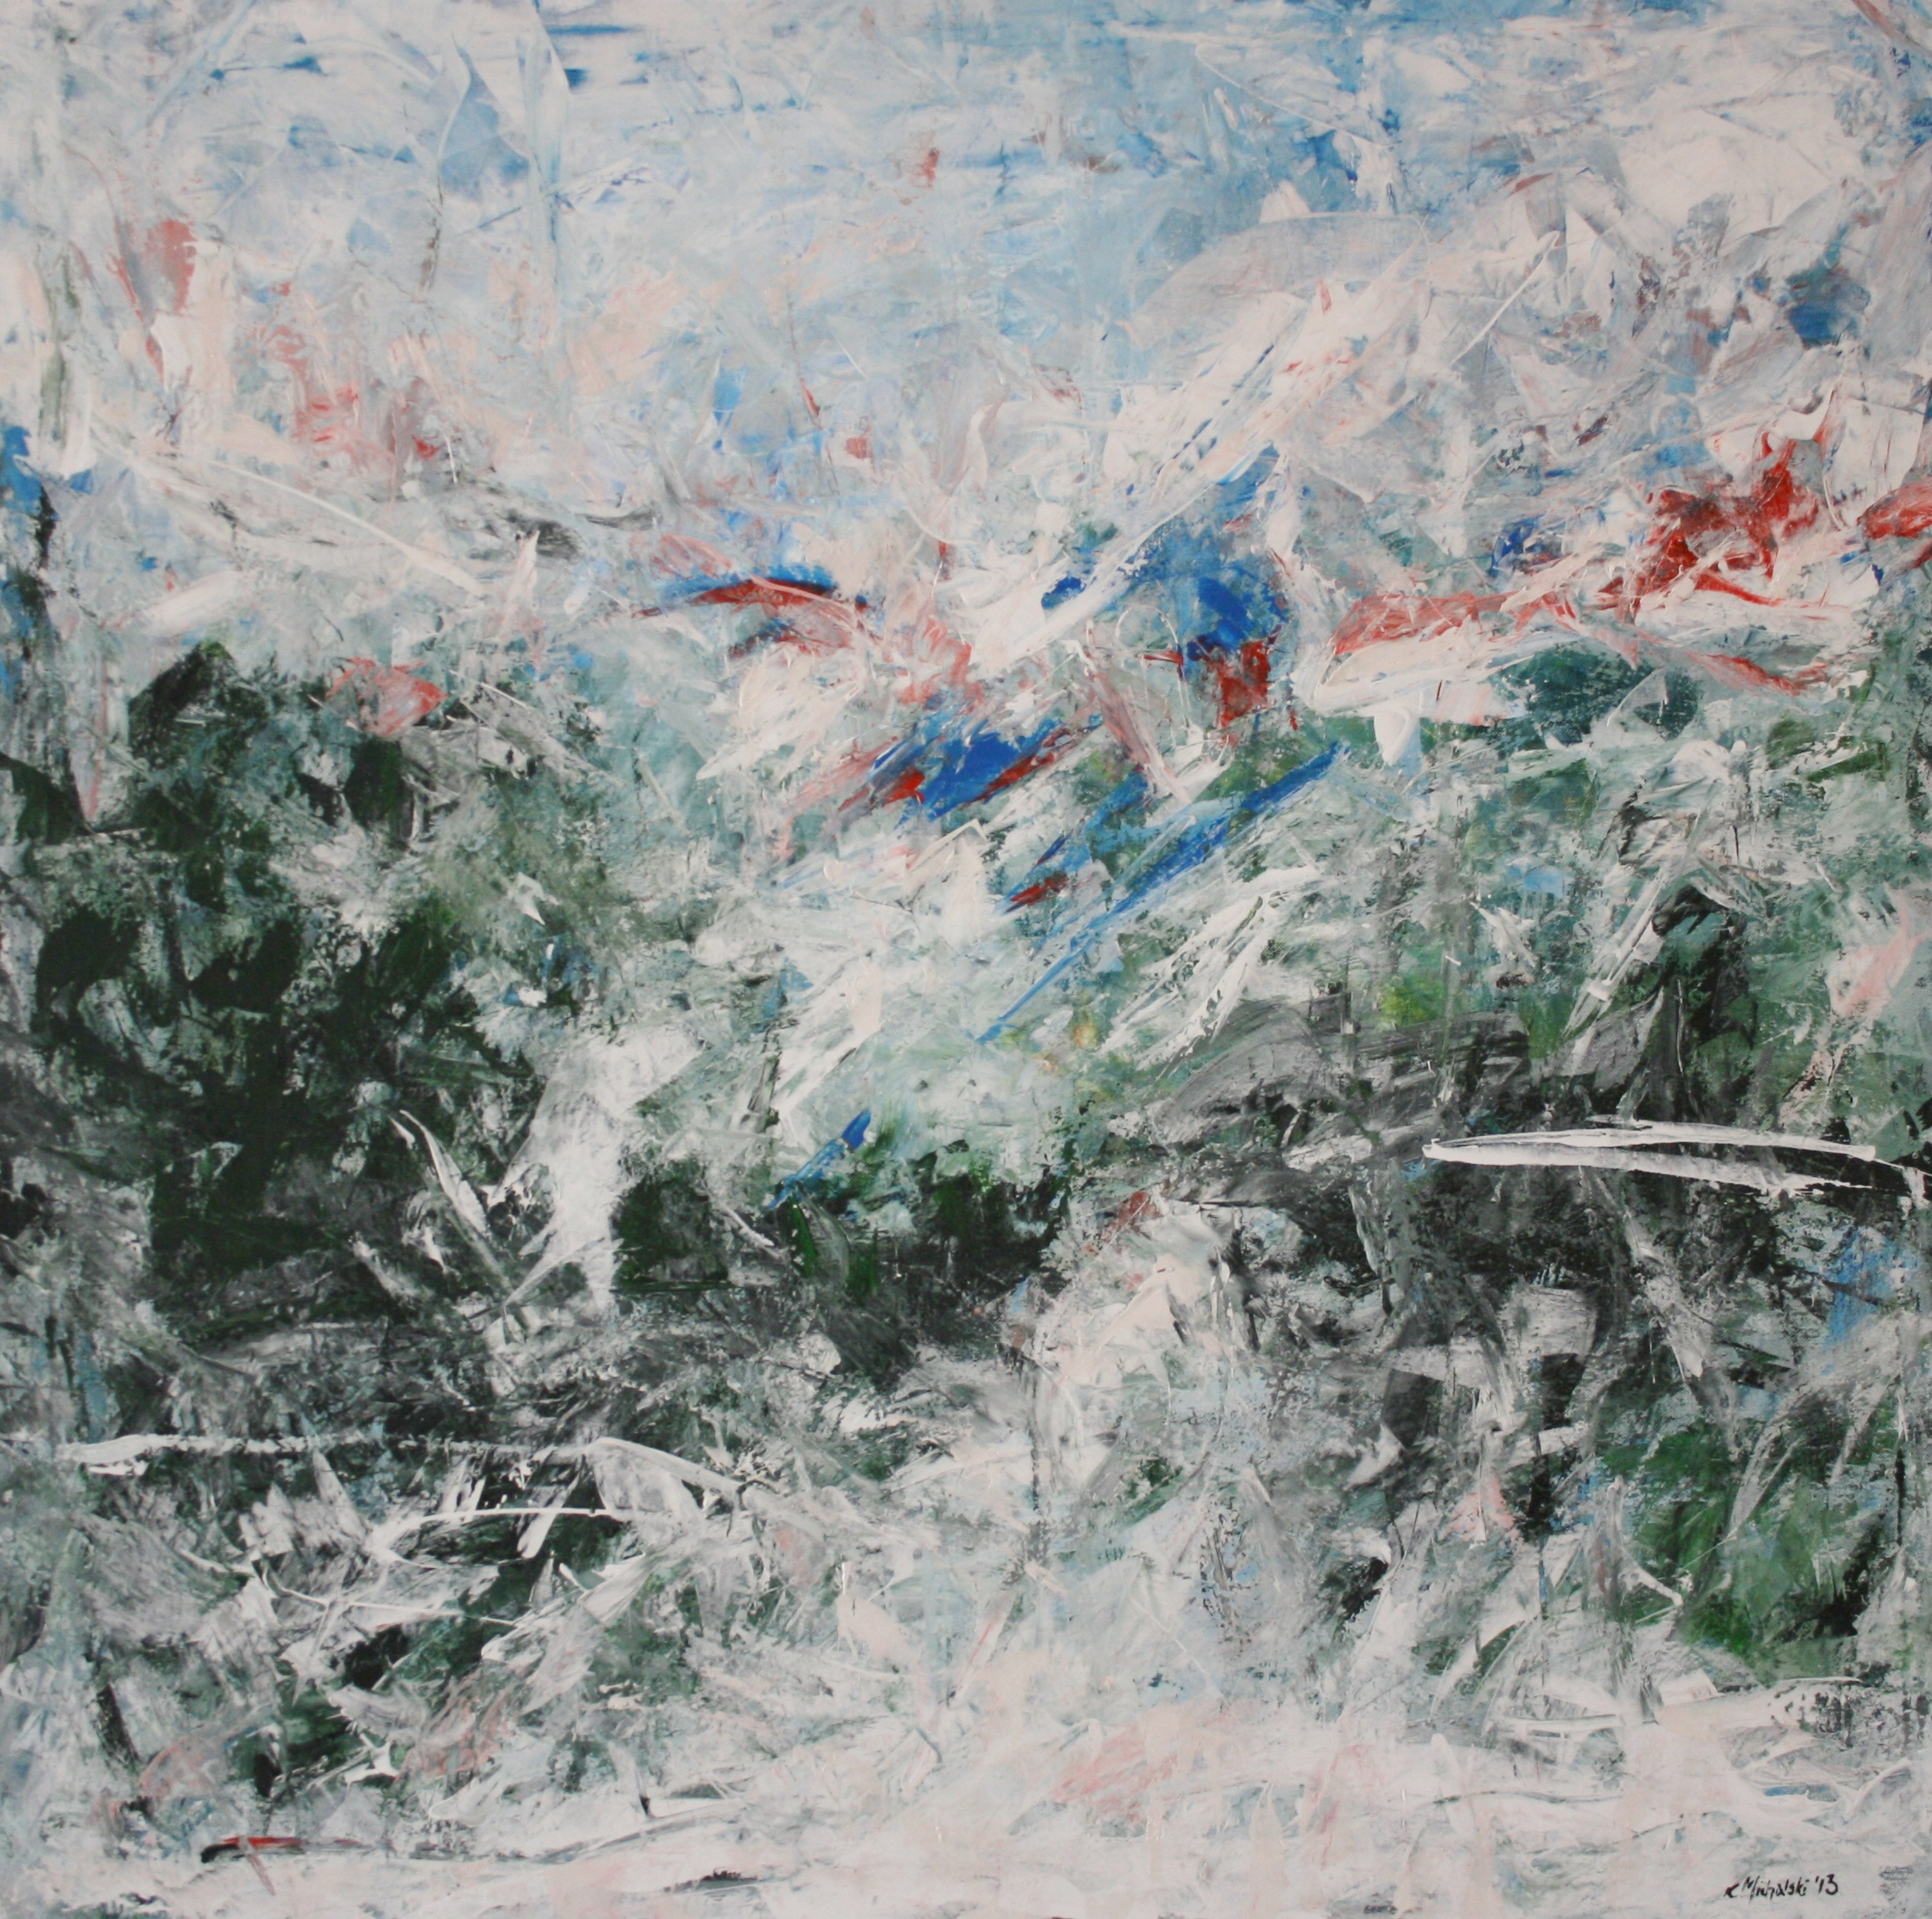 Winter, 2013, 100 x 100, Acryl auf Leinwand